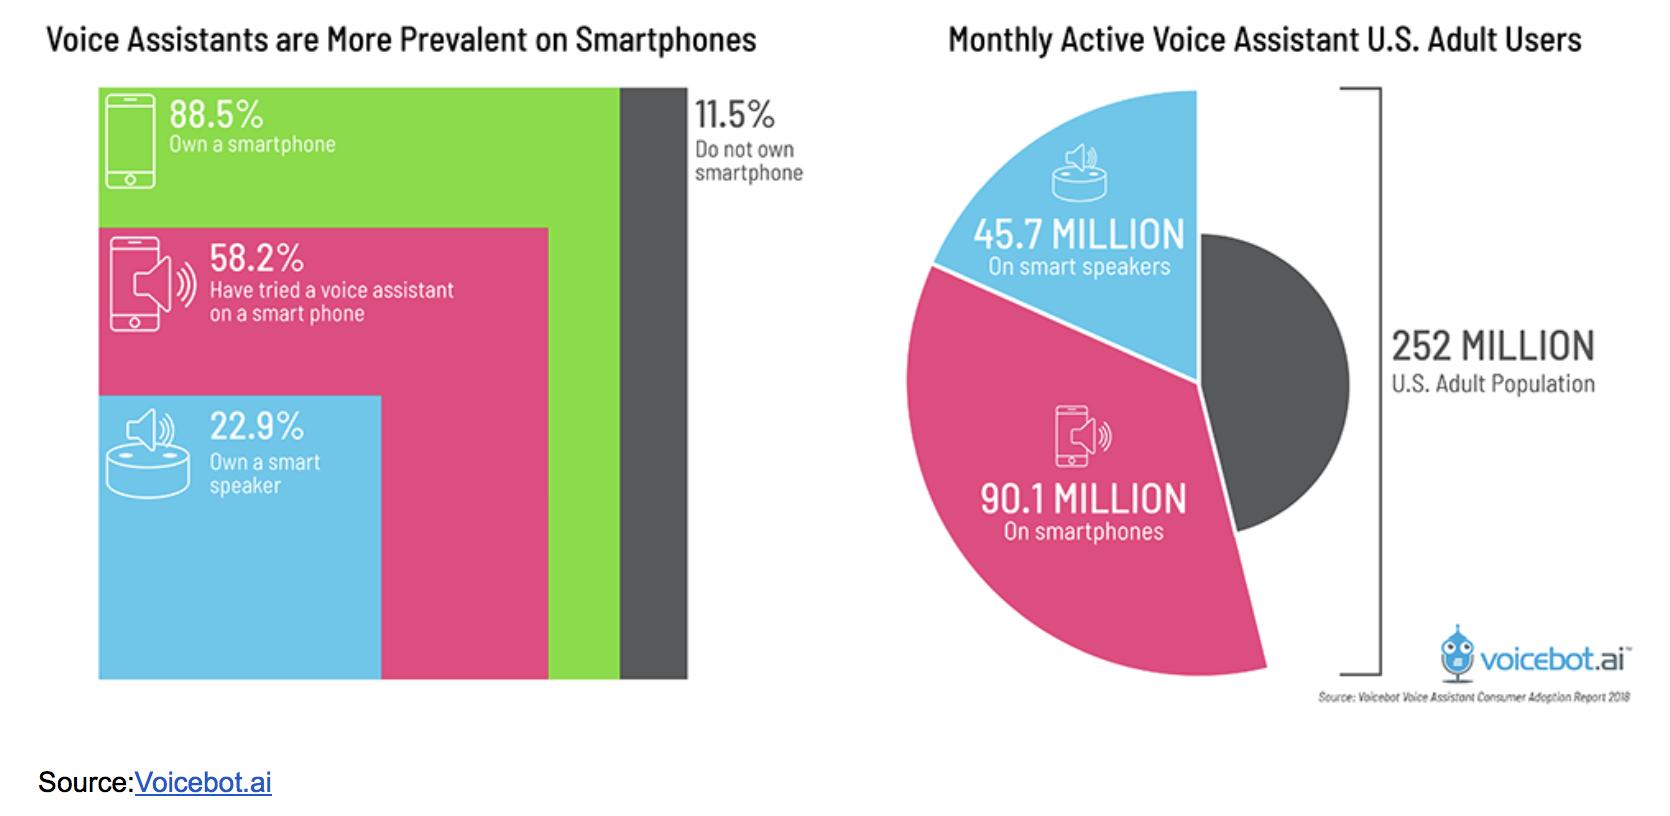 Voice Assistant Usage in Smartphones Data